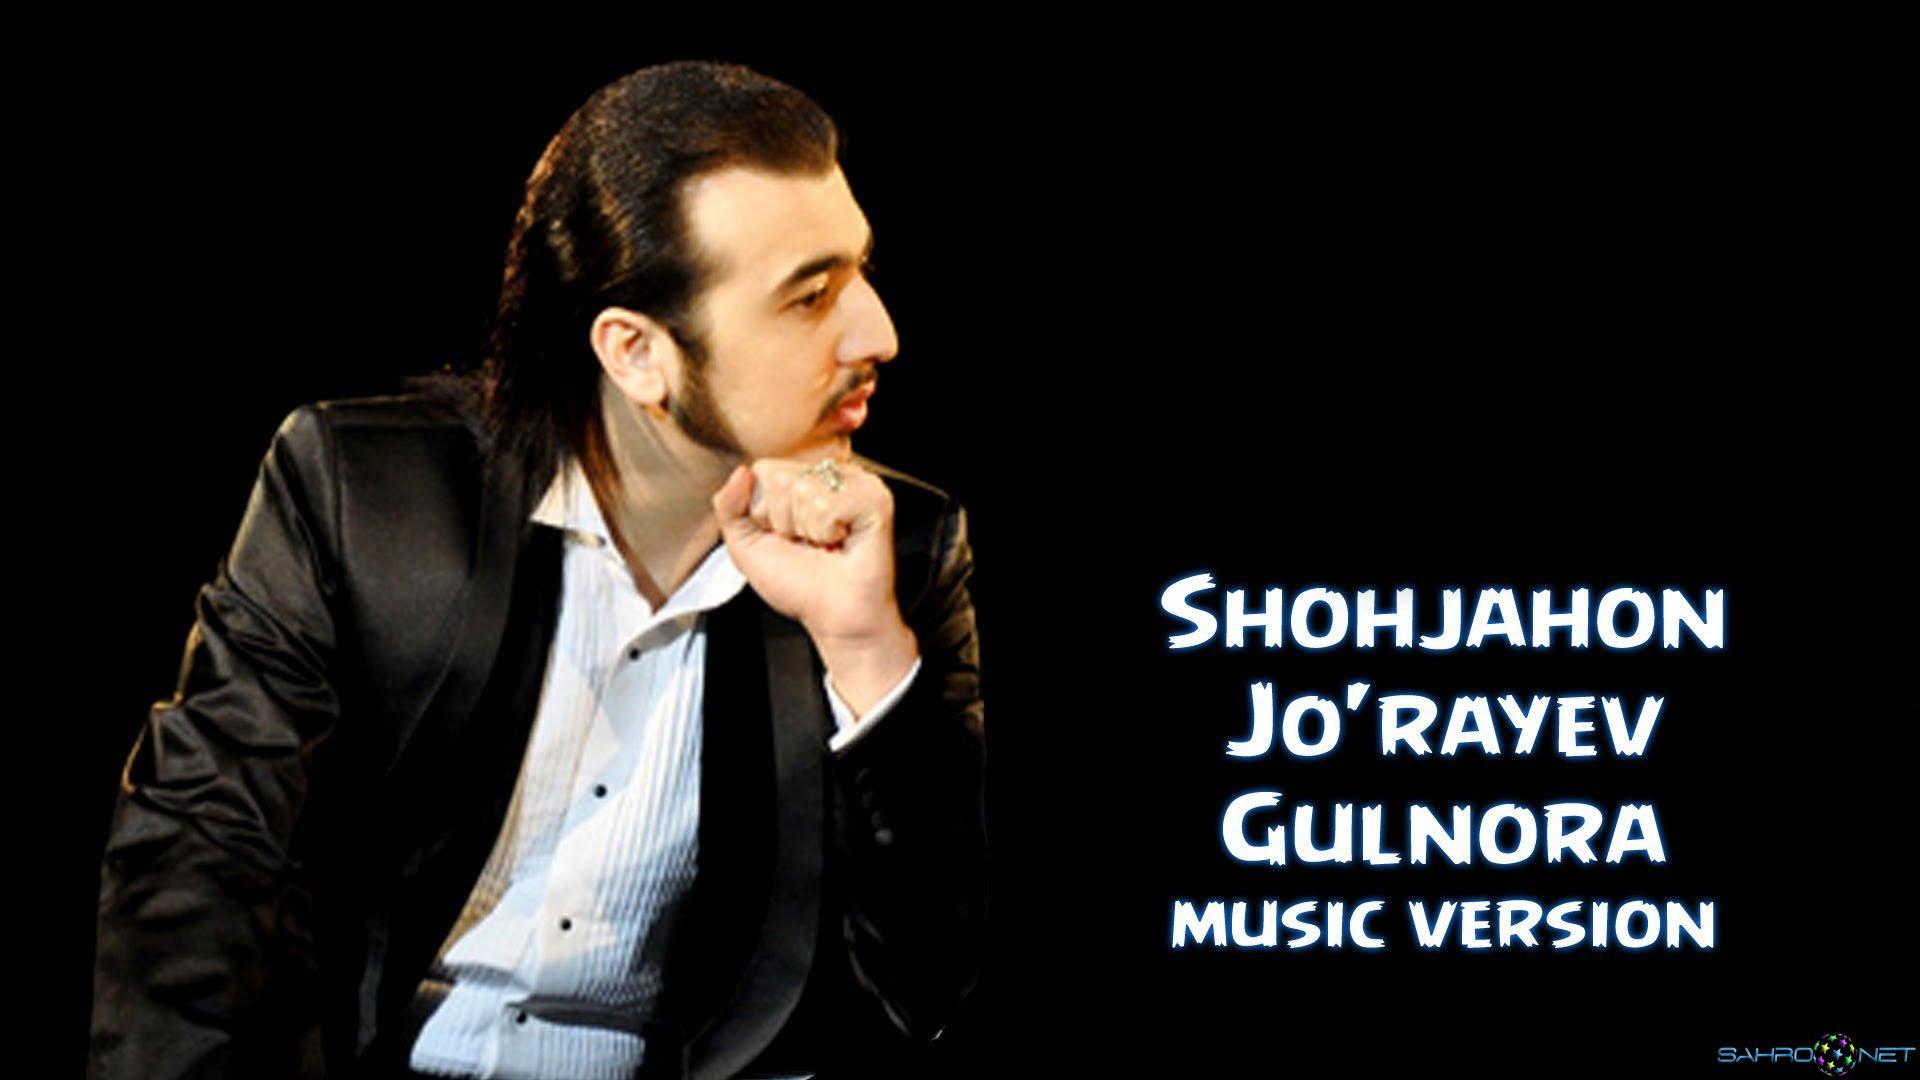 Shohjahon Jo'rayev - Gulnora 2015 Скачать Янги Узб MP3 2015 Янгилари